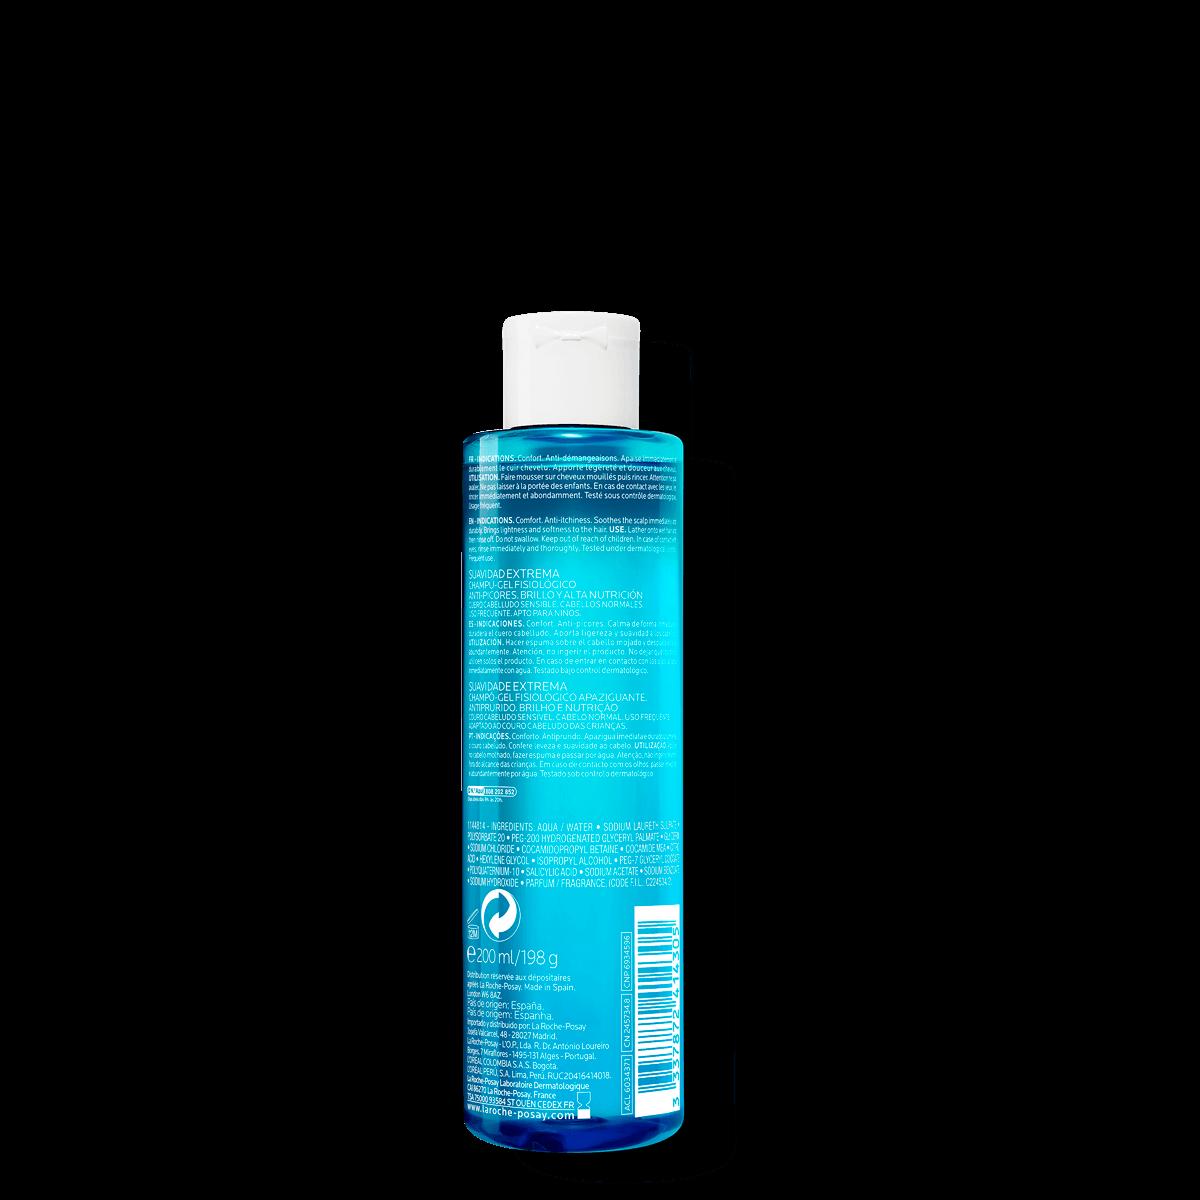 La Roche Posay ProductPage Kerium Extra Gentle Gel Shampoo 200ml 33378